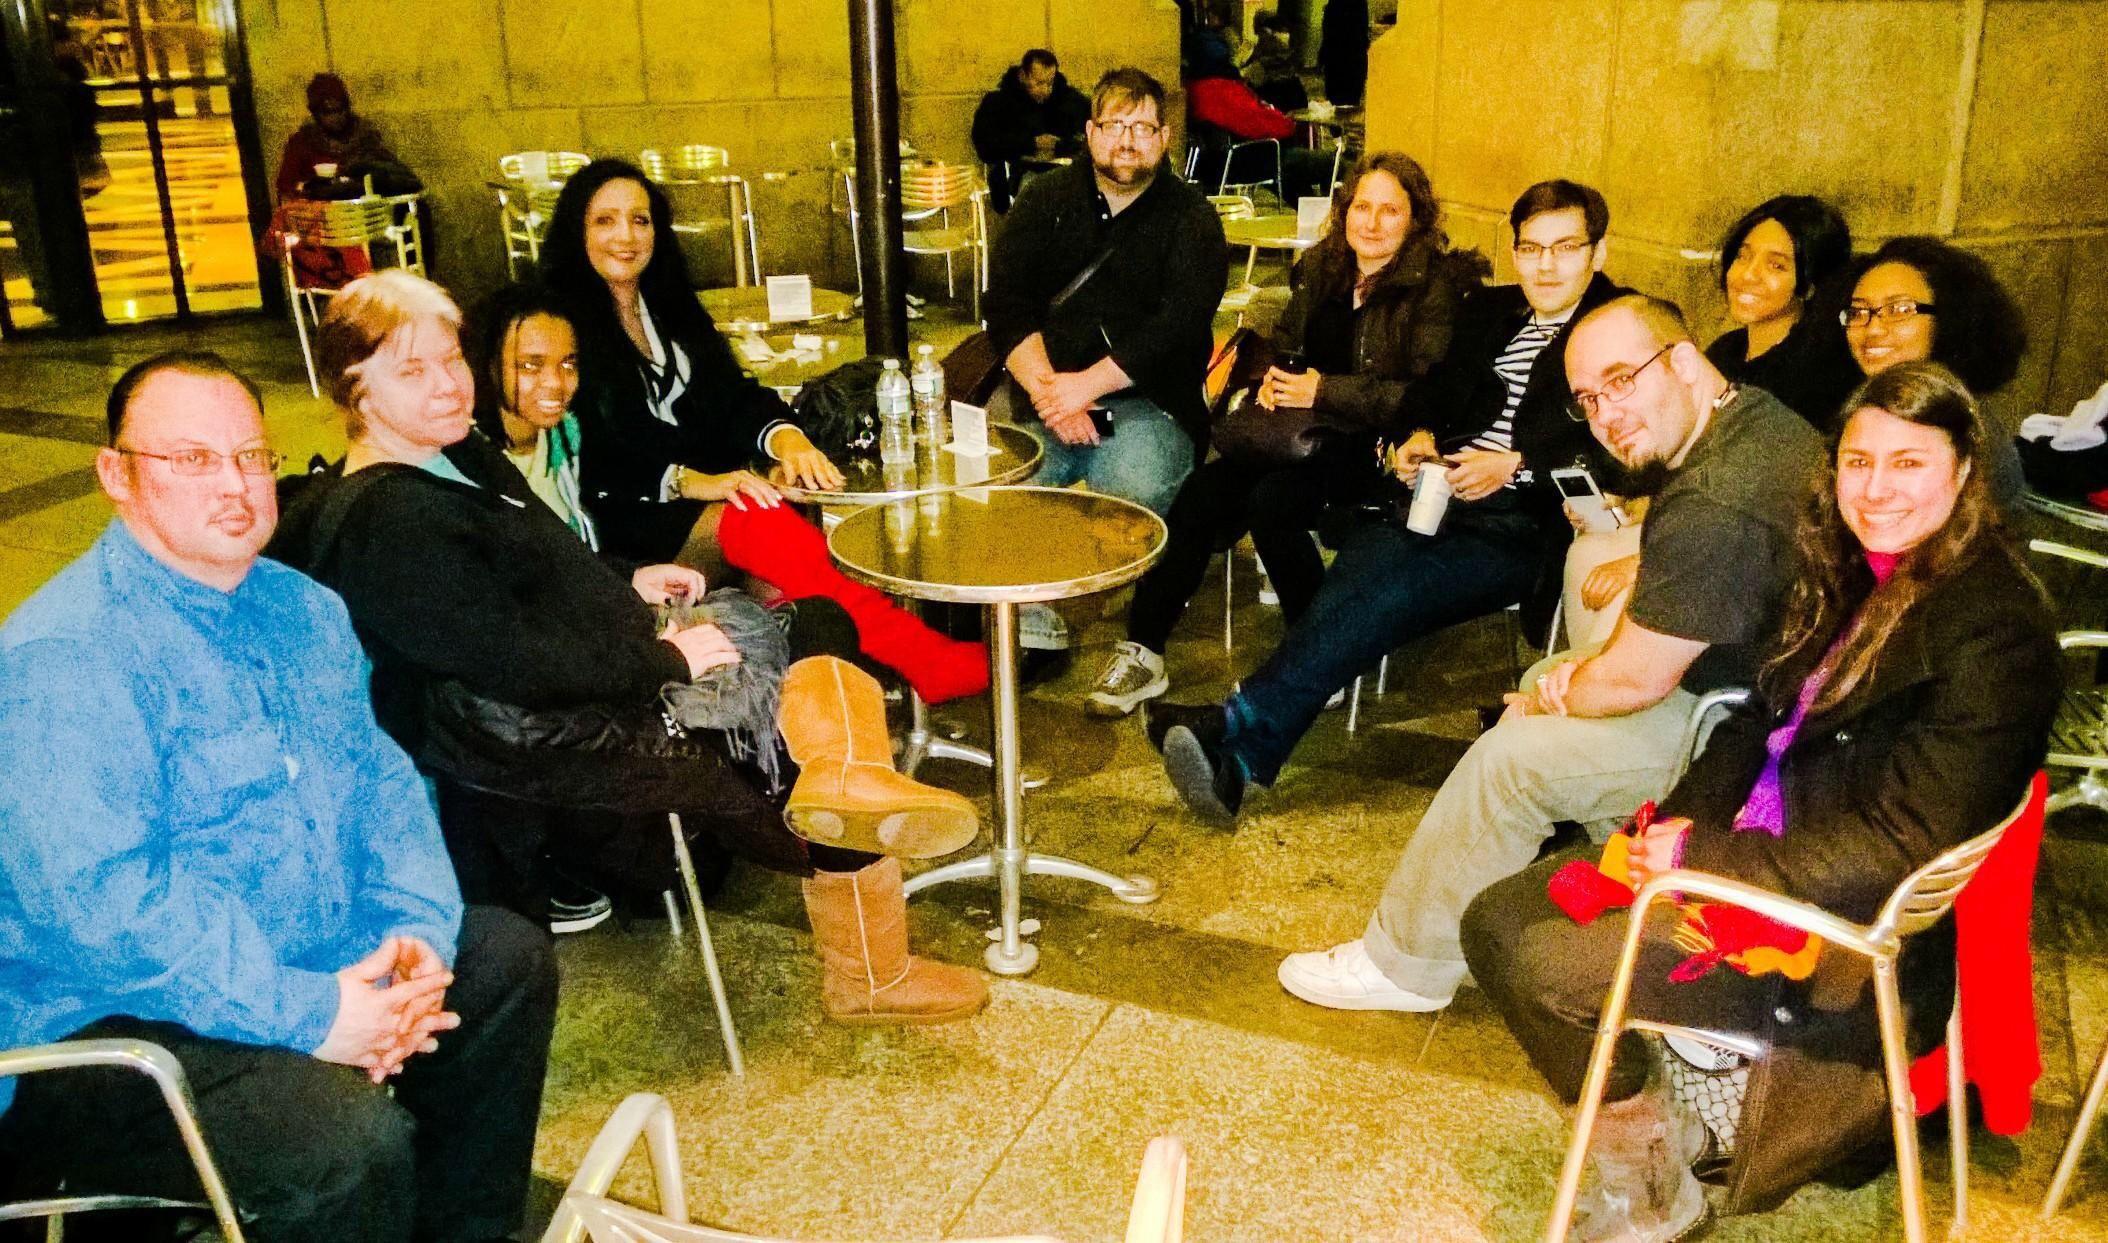 Dating meetup groups new york city